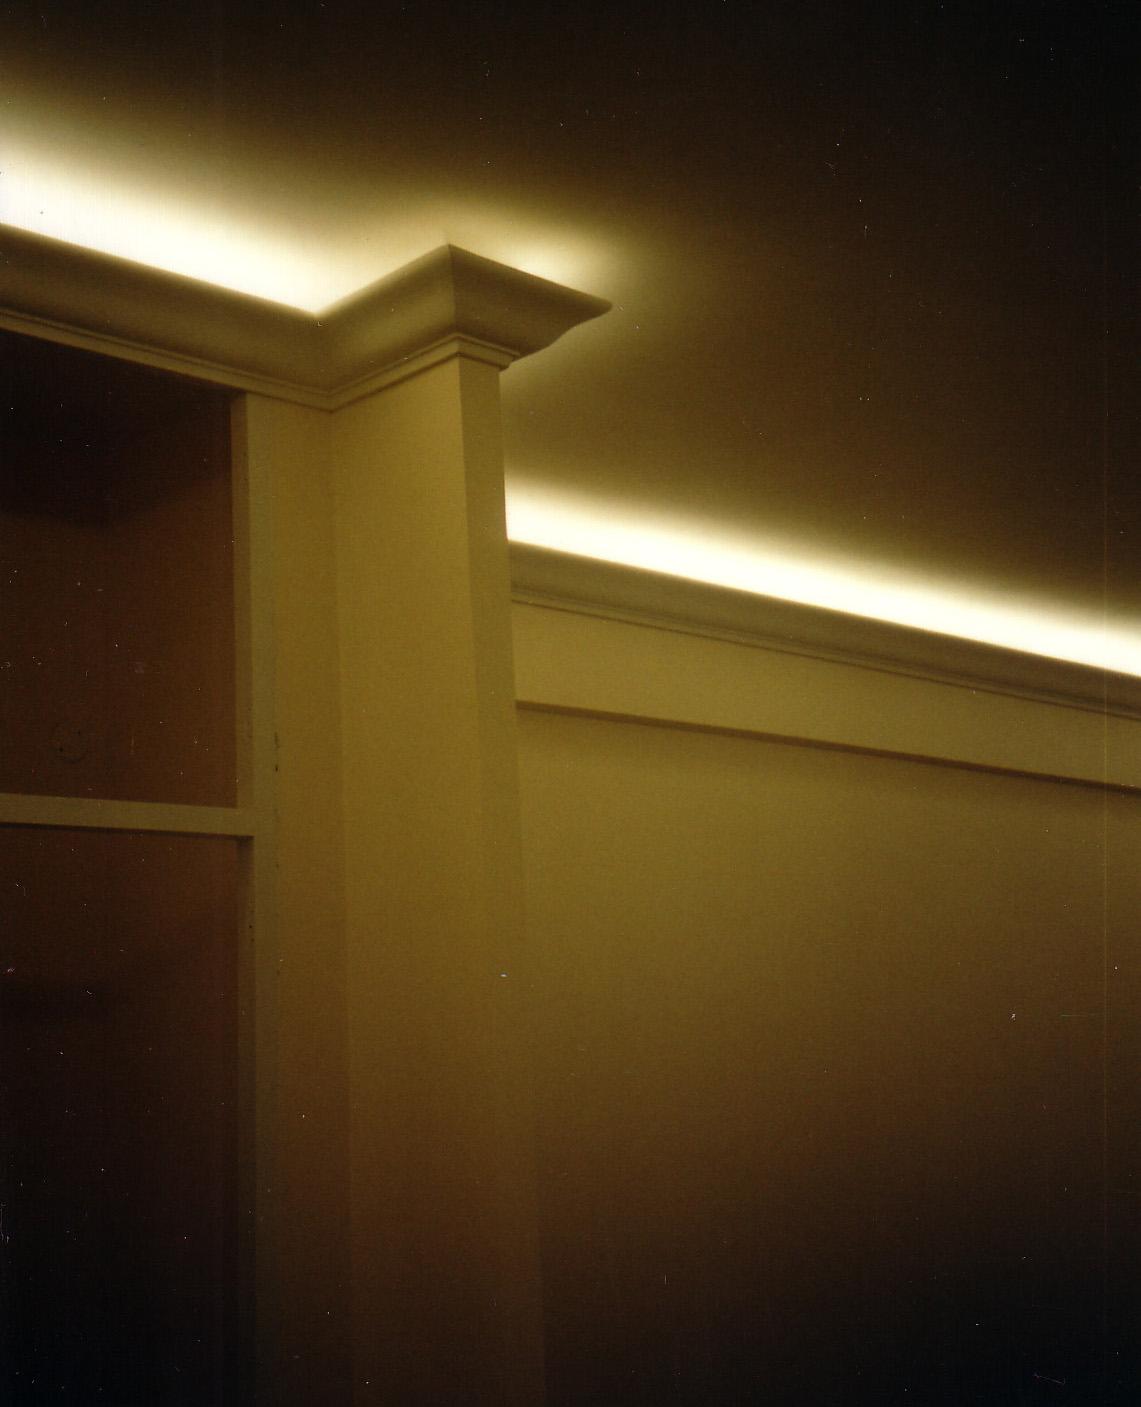 Stuccolina con luce diffusa.